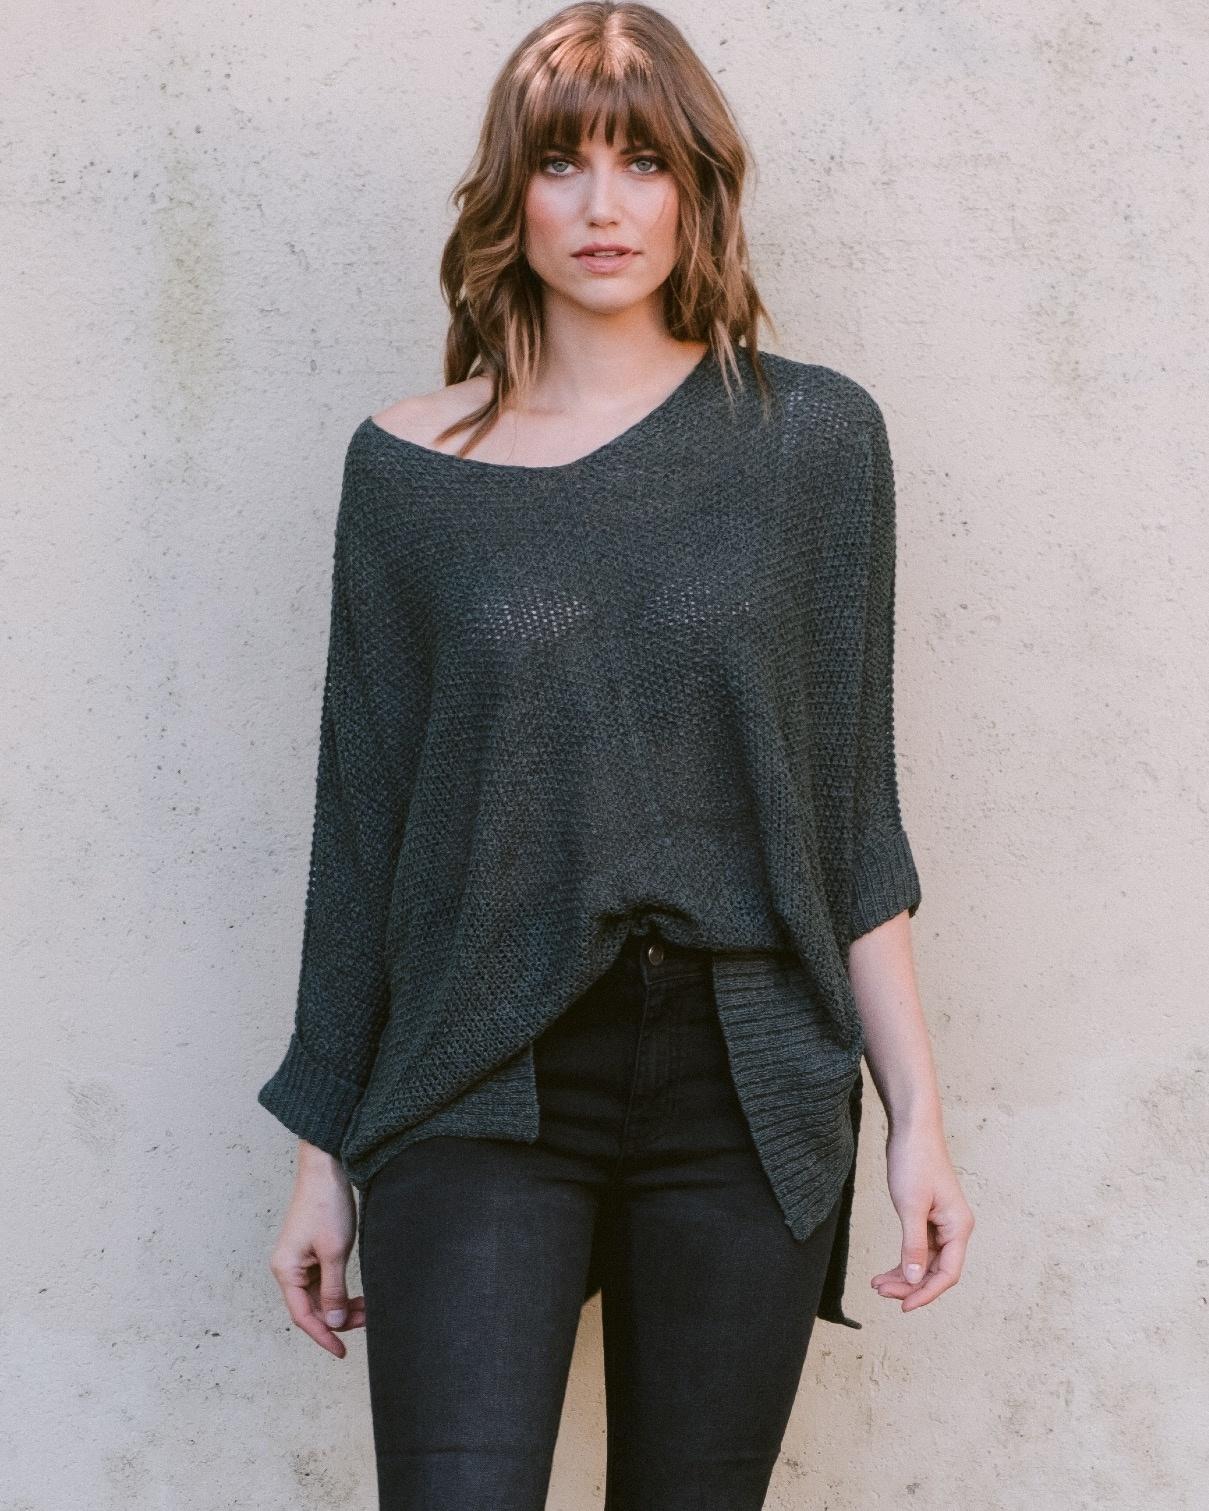 Sweater Sea Green Cuff Knit